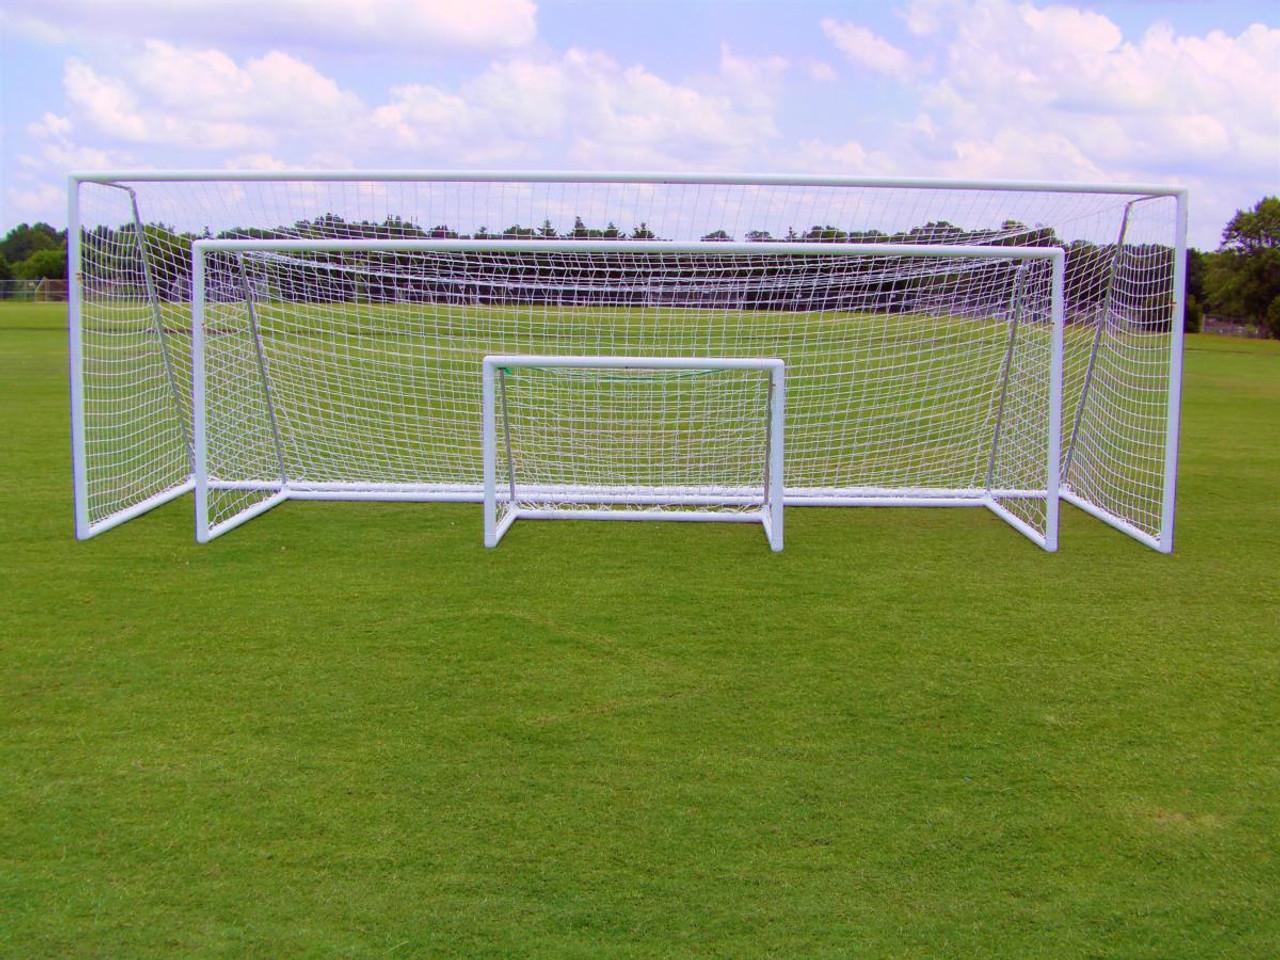 Pevo soccer goals 8' x 24' park series_4